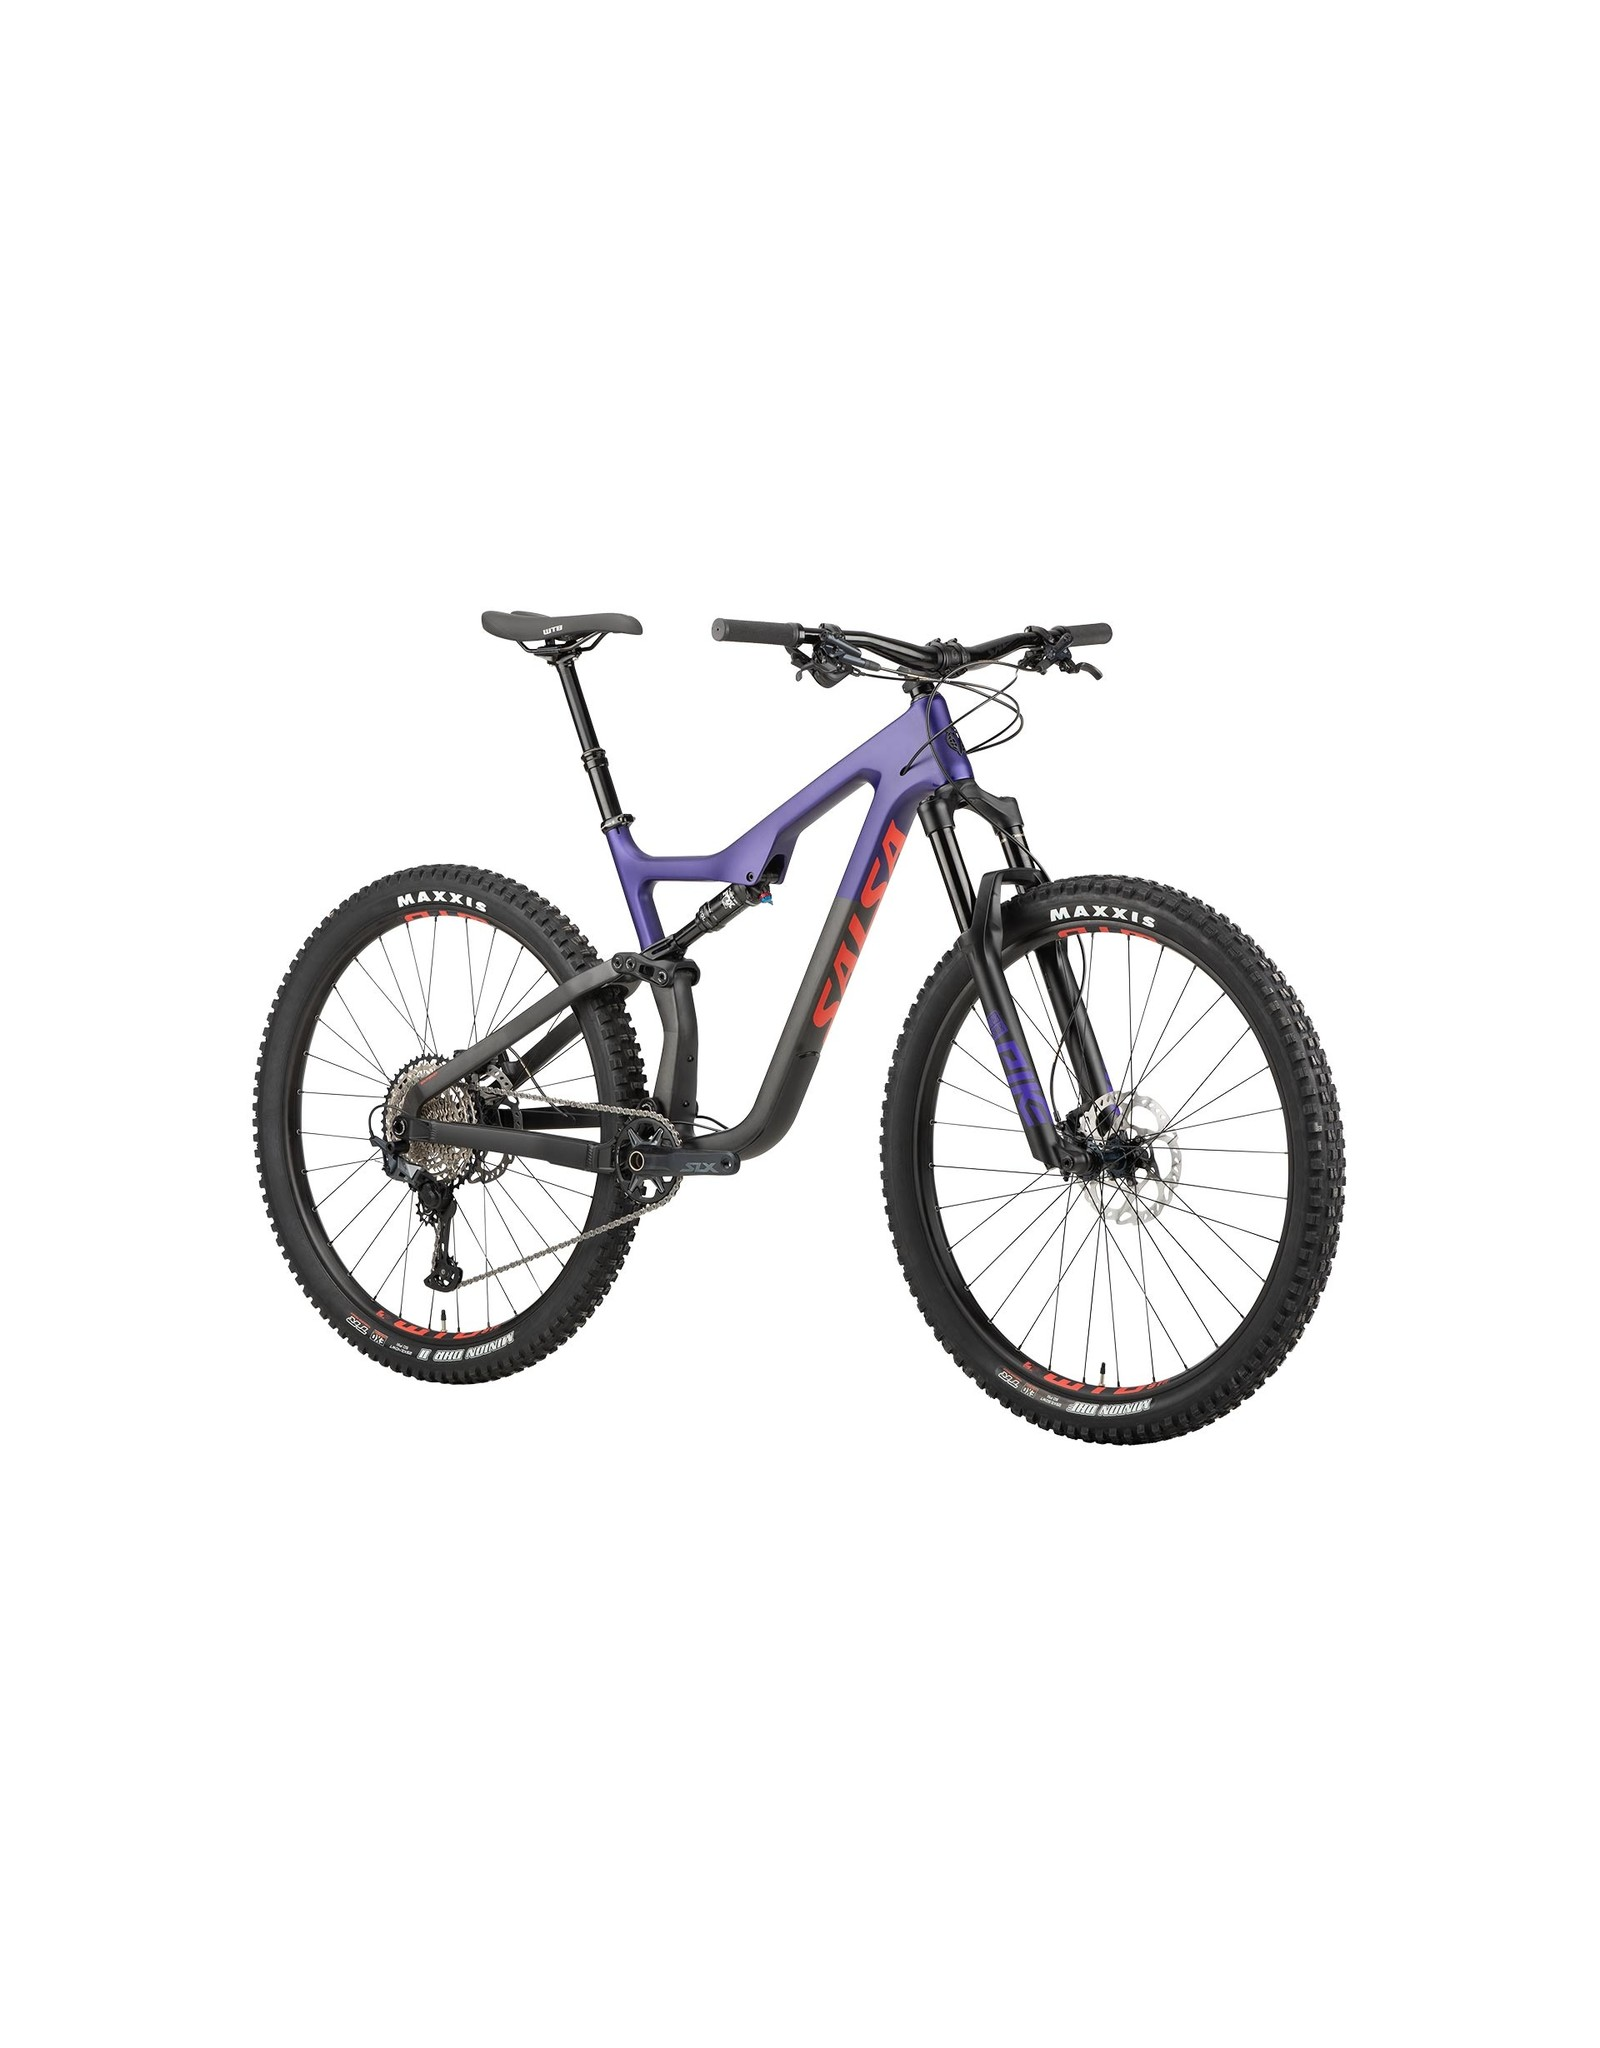 "Salsa Salsa Horsethief Carbon SLX Bike - 29"" Small Carbon, Purple/Black,"